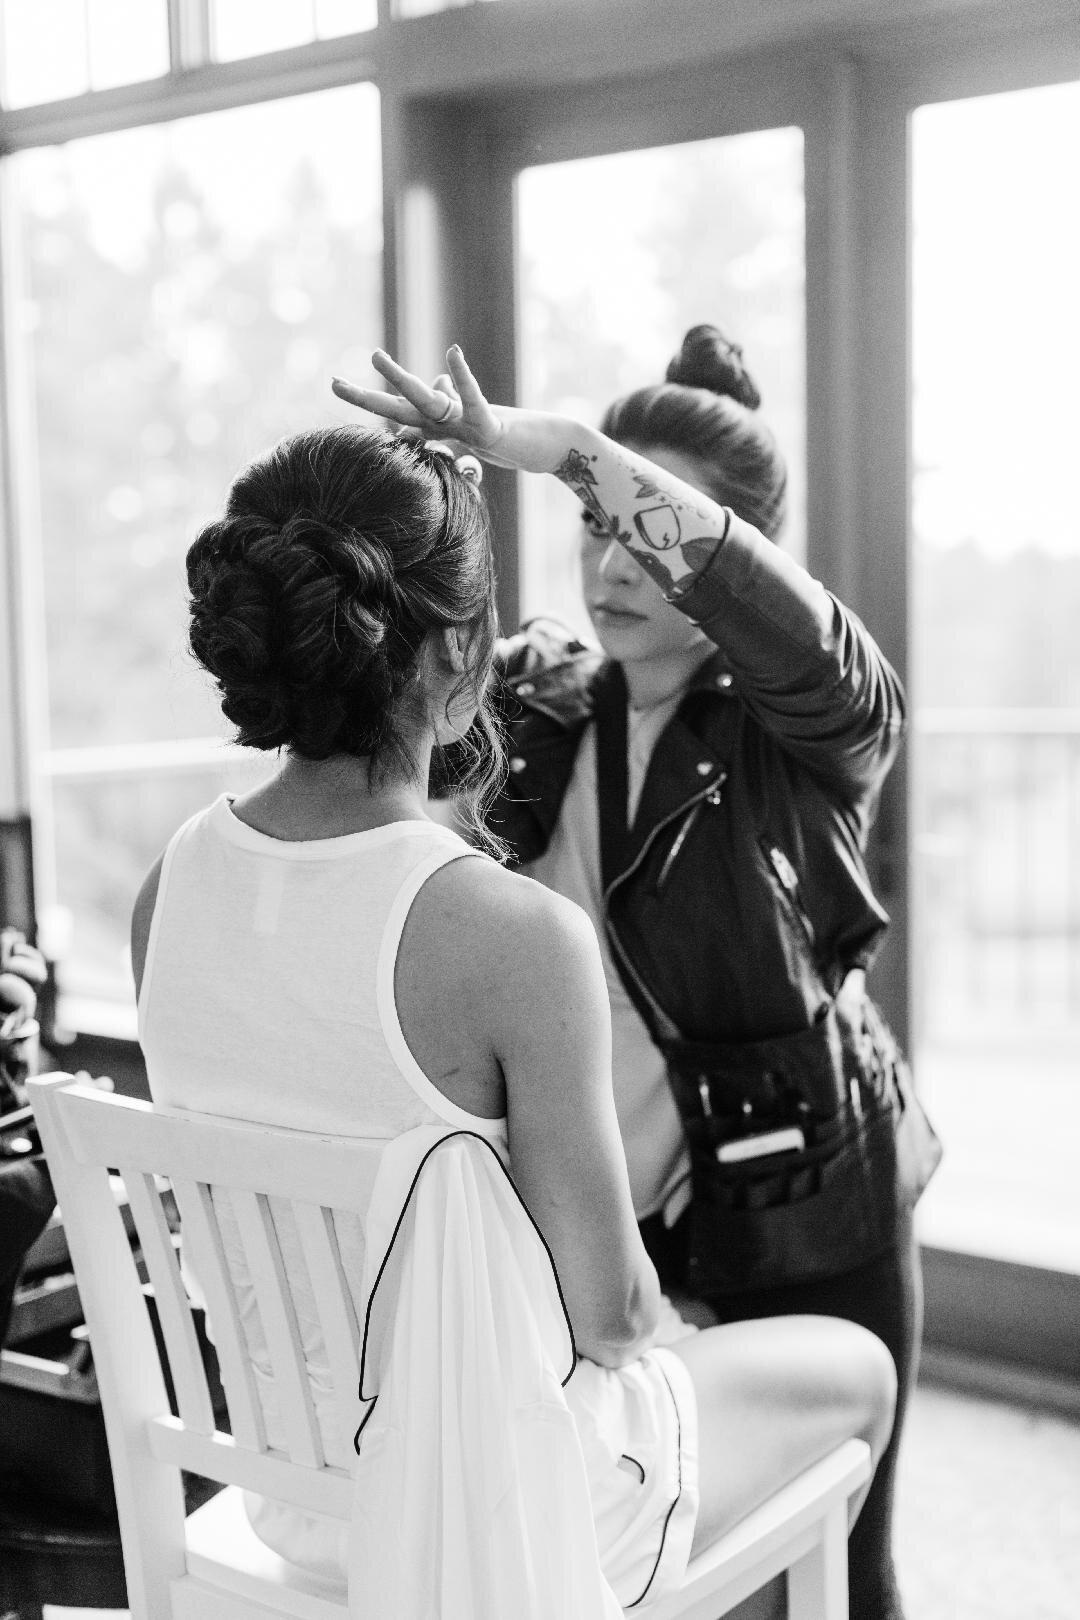 Bridal Portfolio - See photos of some of my beautiful brides & bridal parties!